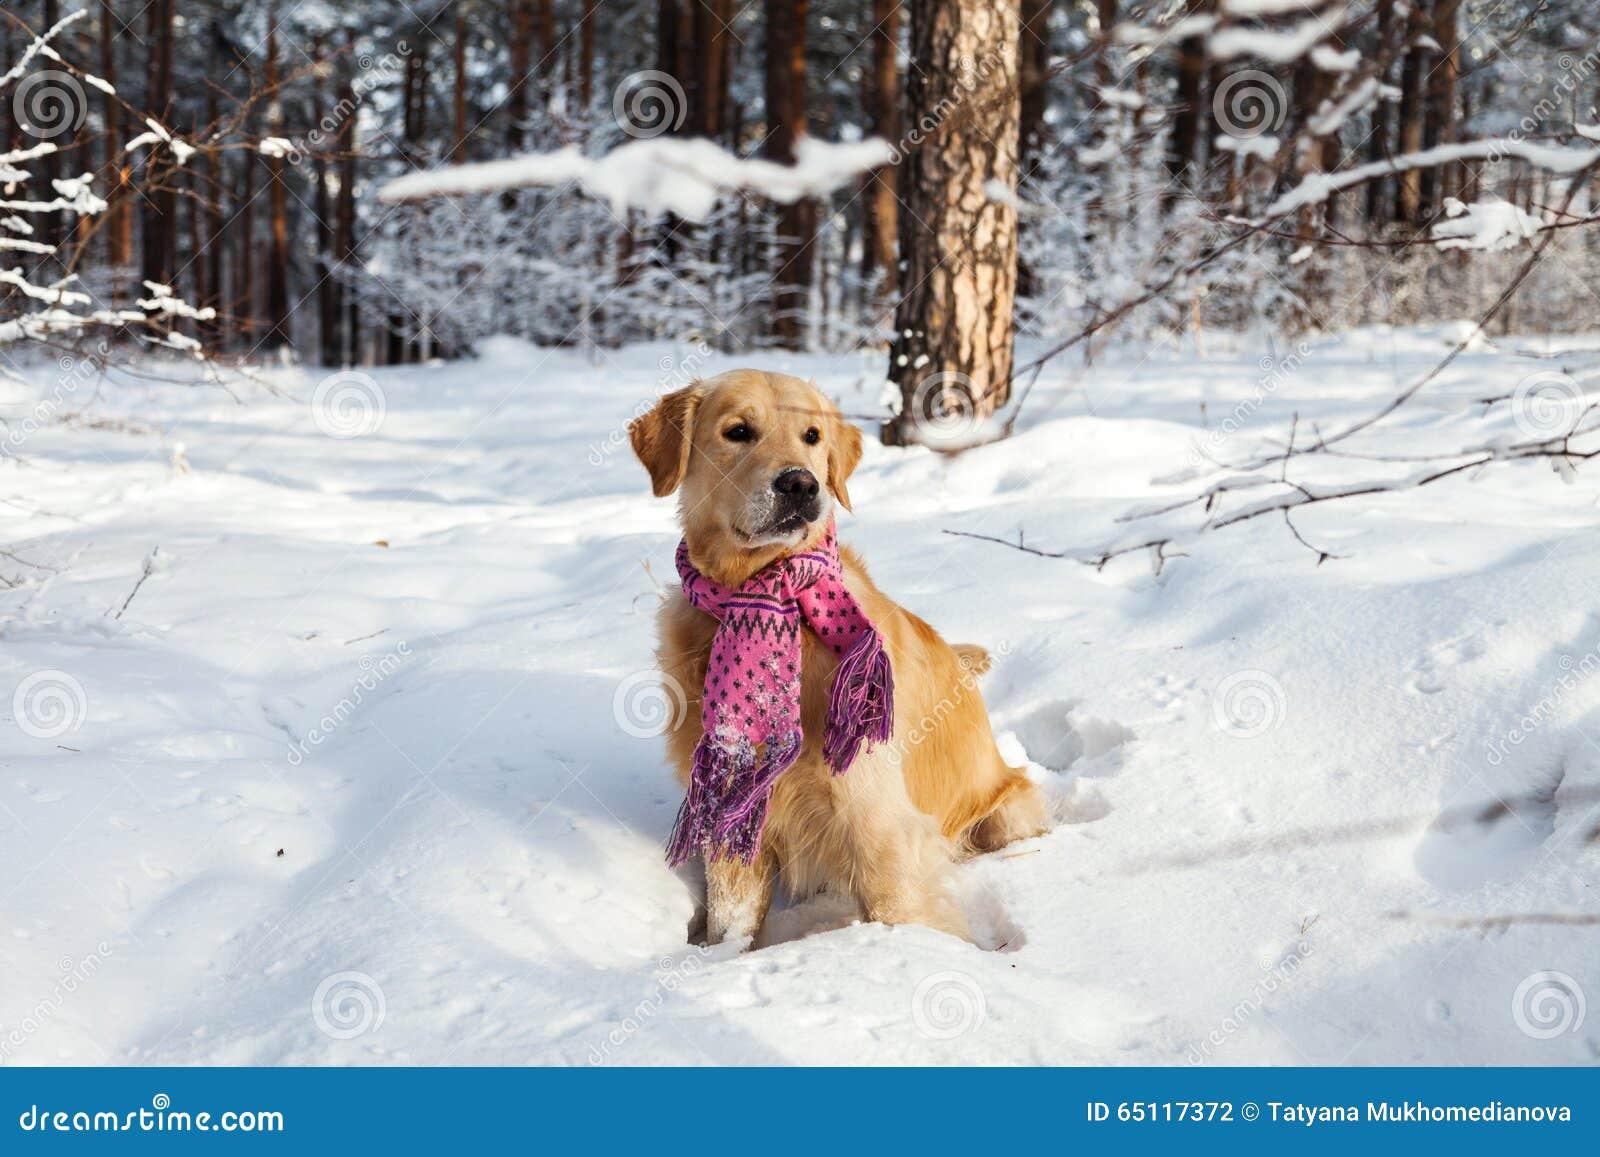 Golden Retriever in a pink scarf running through the snow